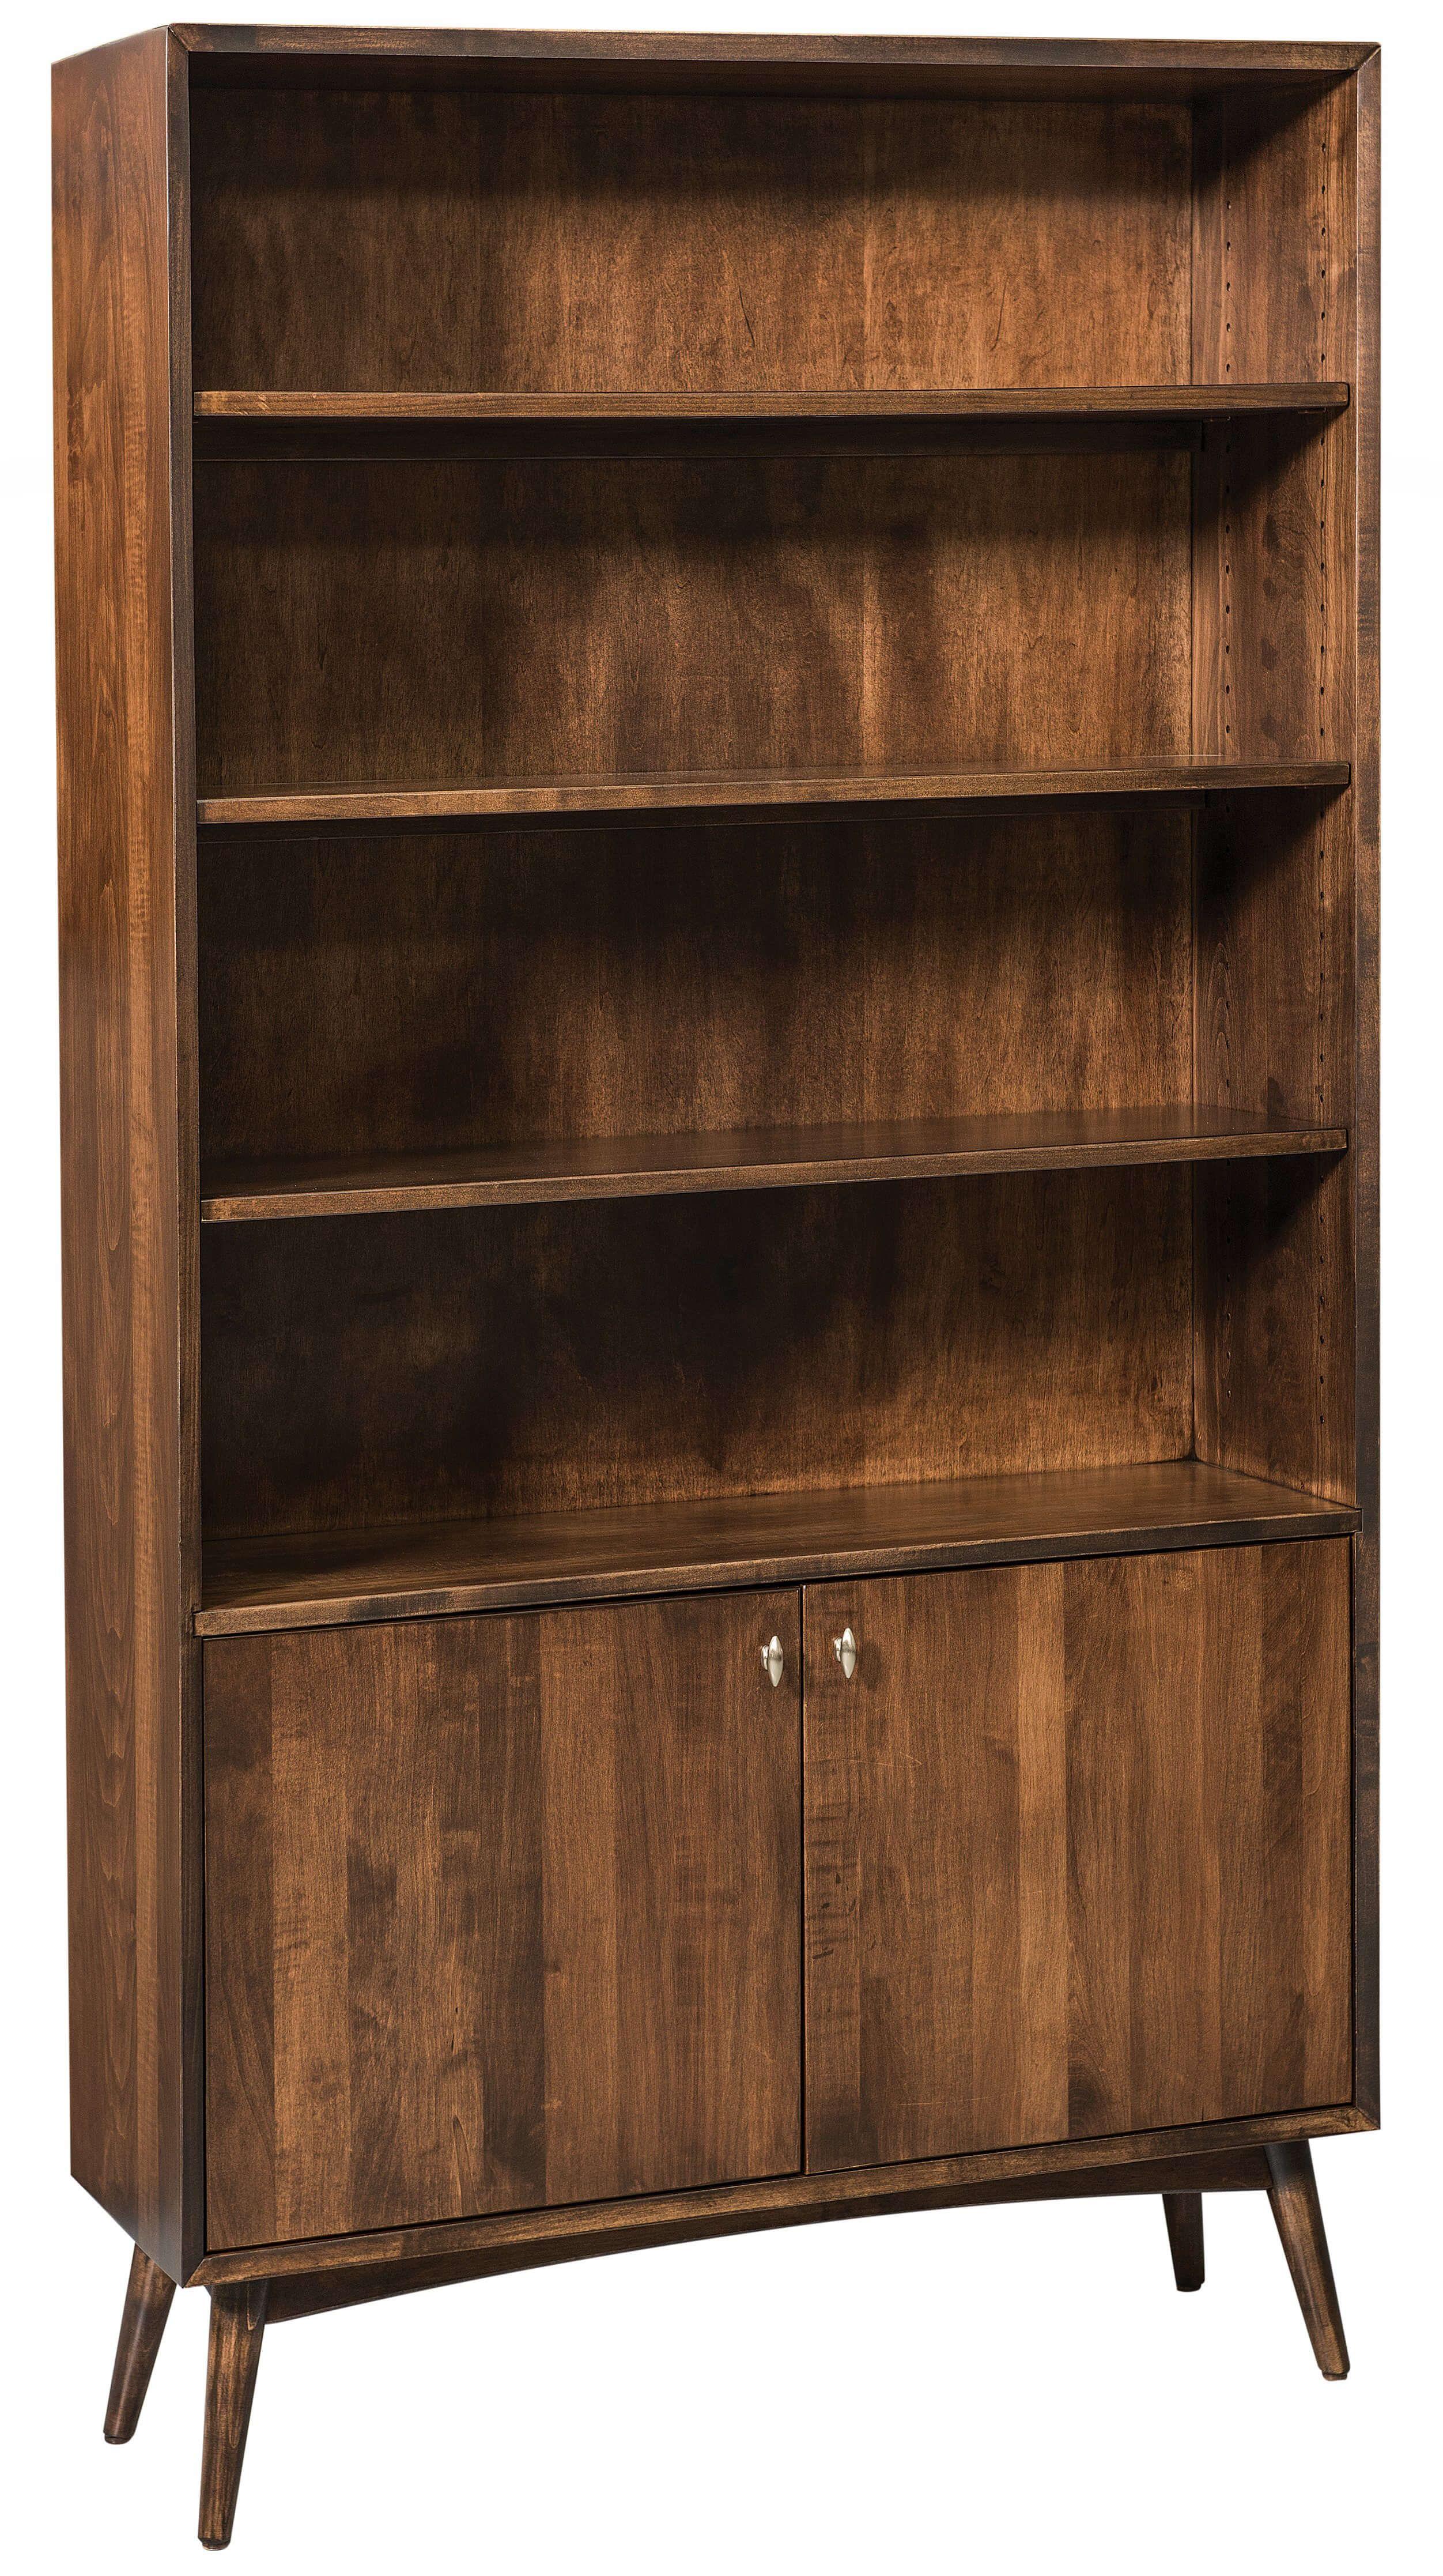 Mid Century Style Storage Bookshelf. Draper Storage Bookcase